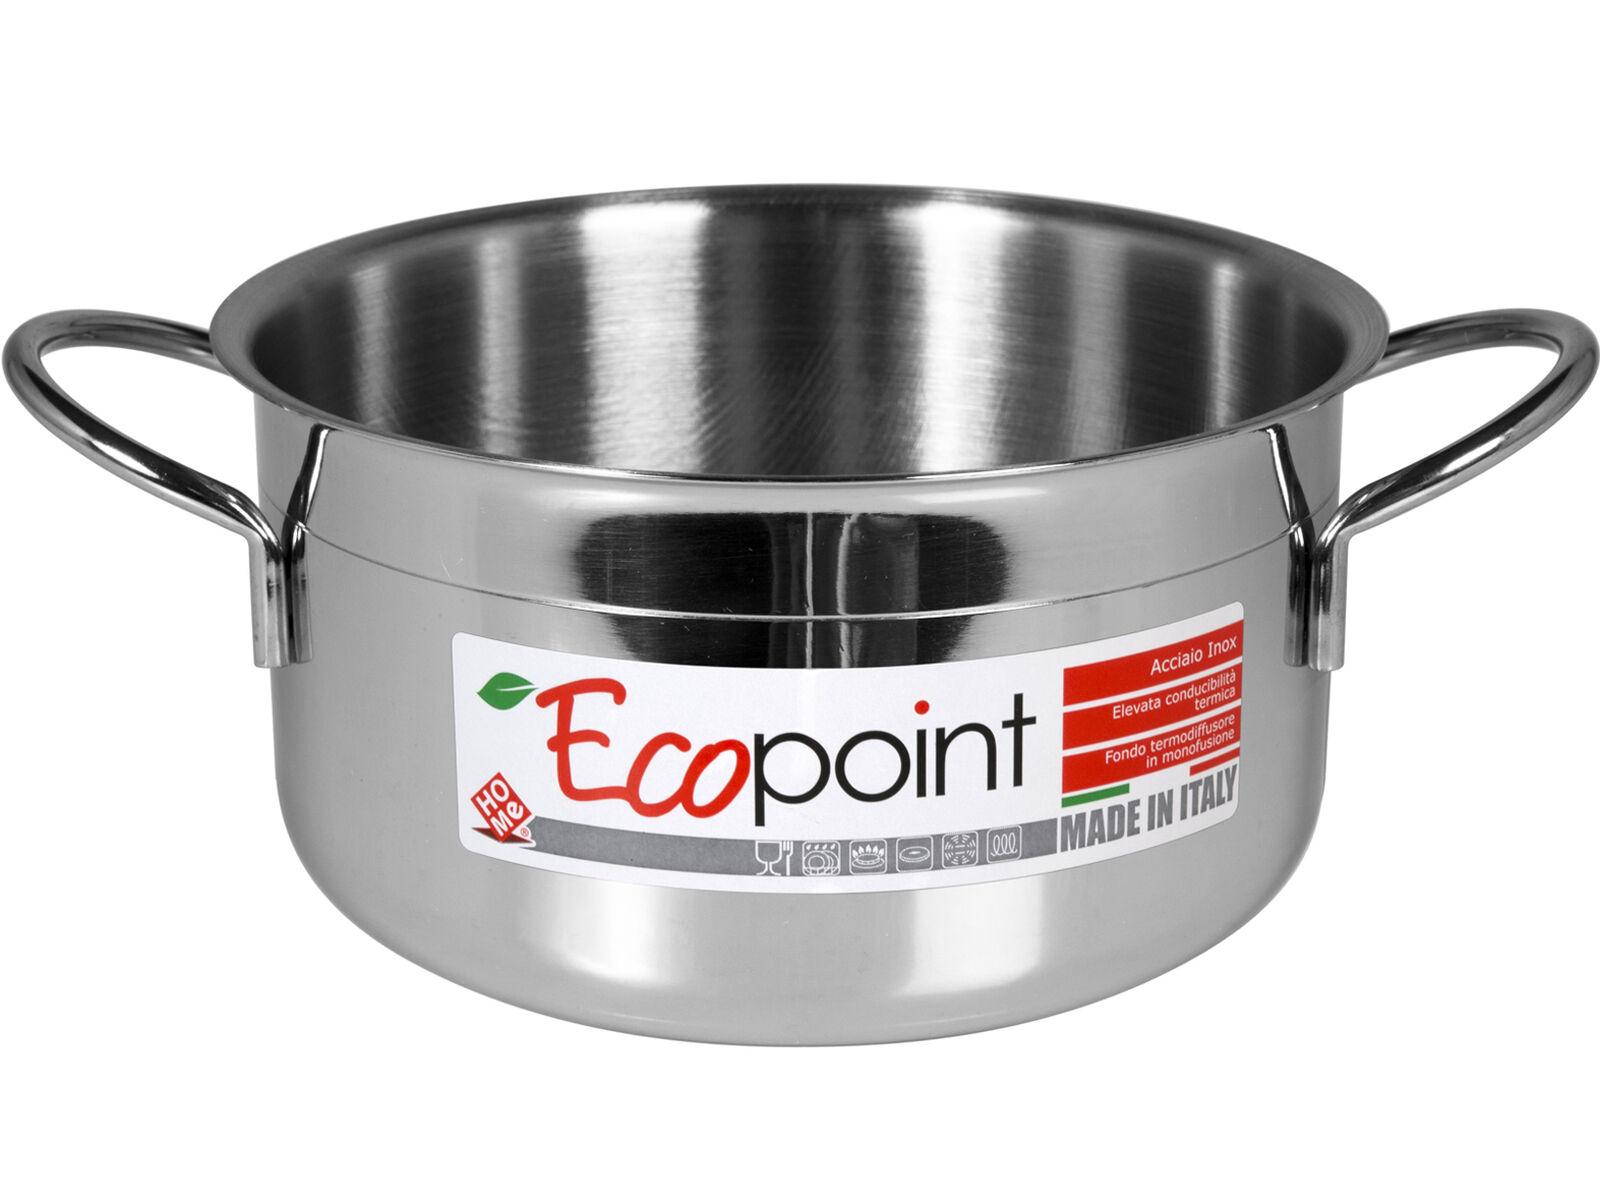 HOME Casseruola Inox Ecopoint Due Manici Cm 34 pentola da cucina